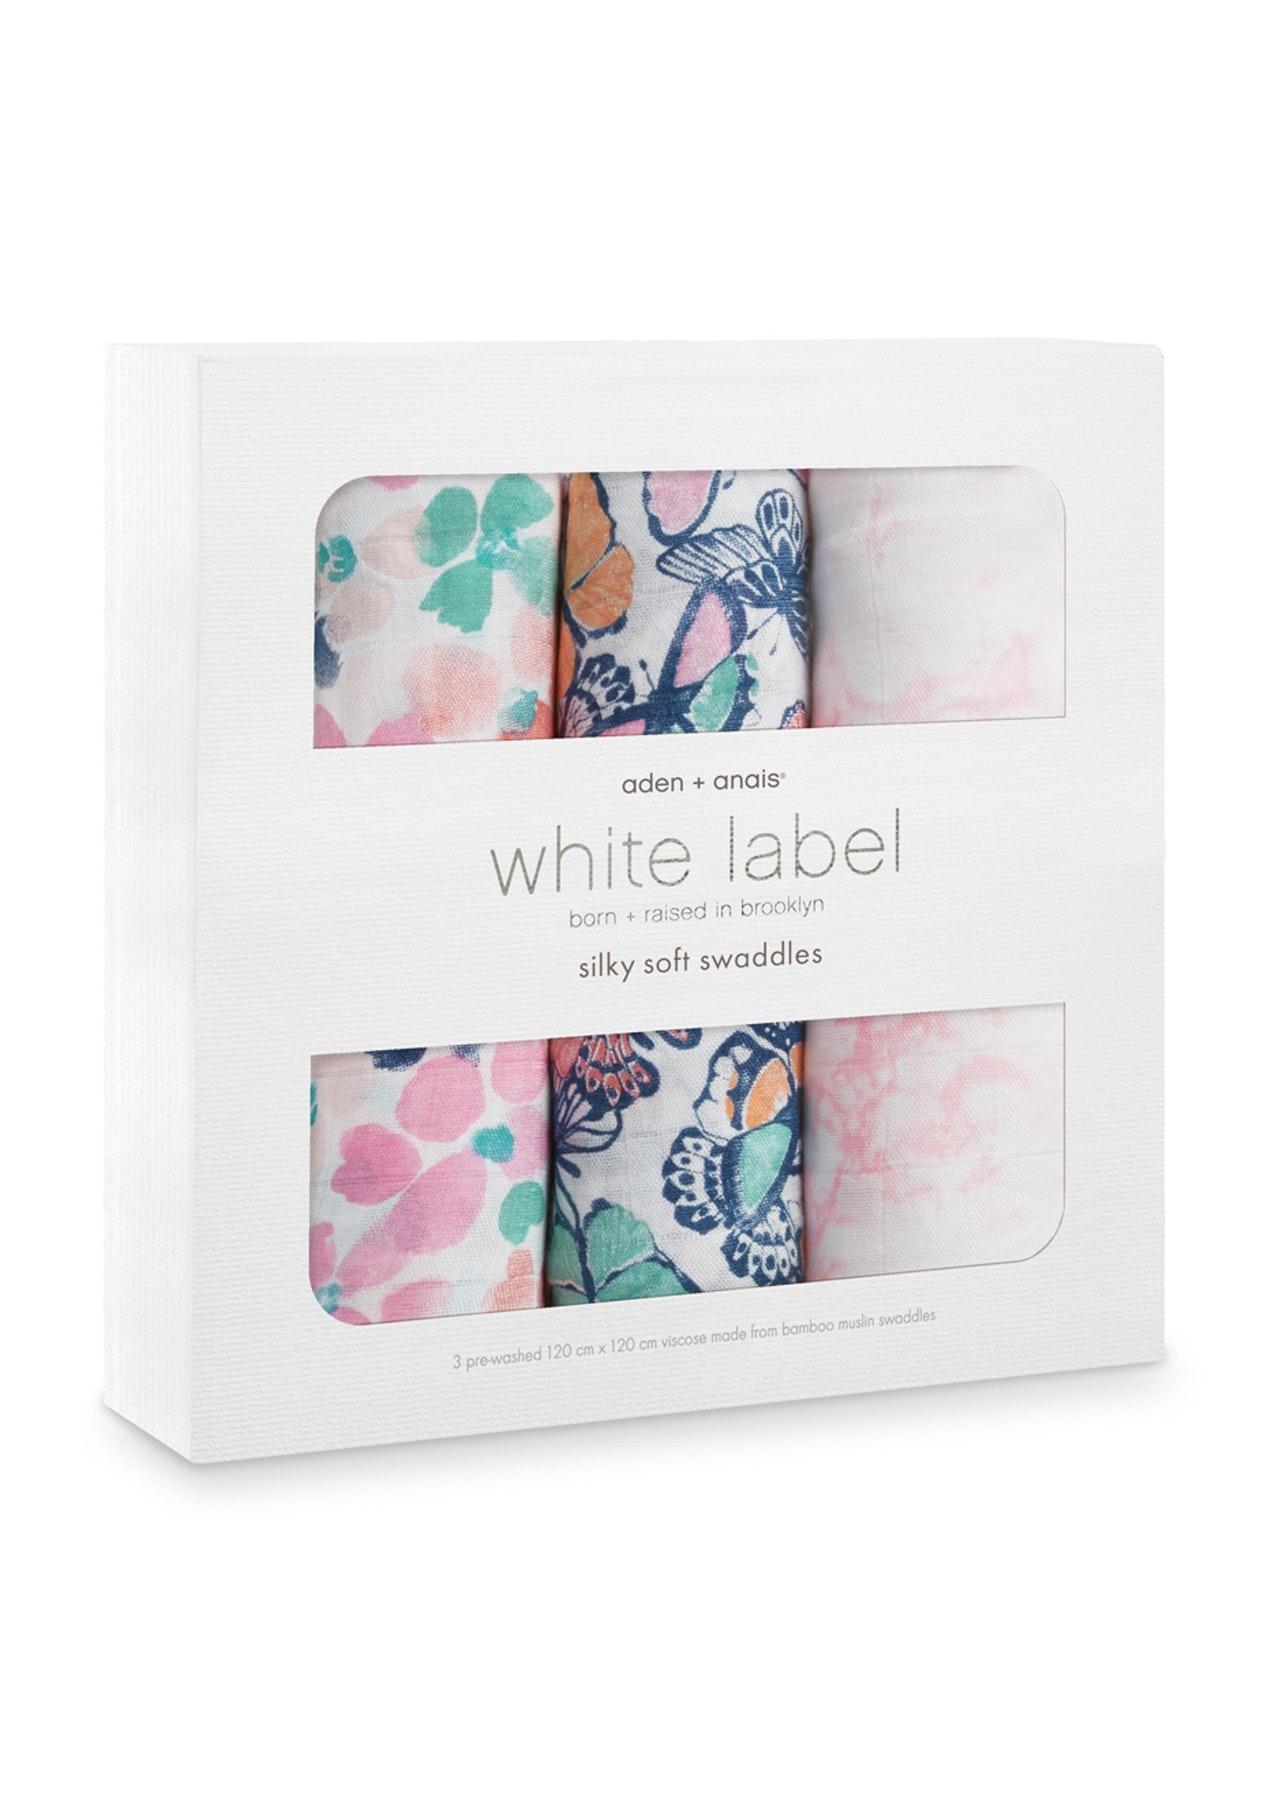 Aden & Anais Viscose Muslin Swaddles - 3pk - White Label